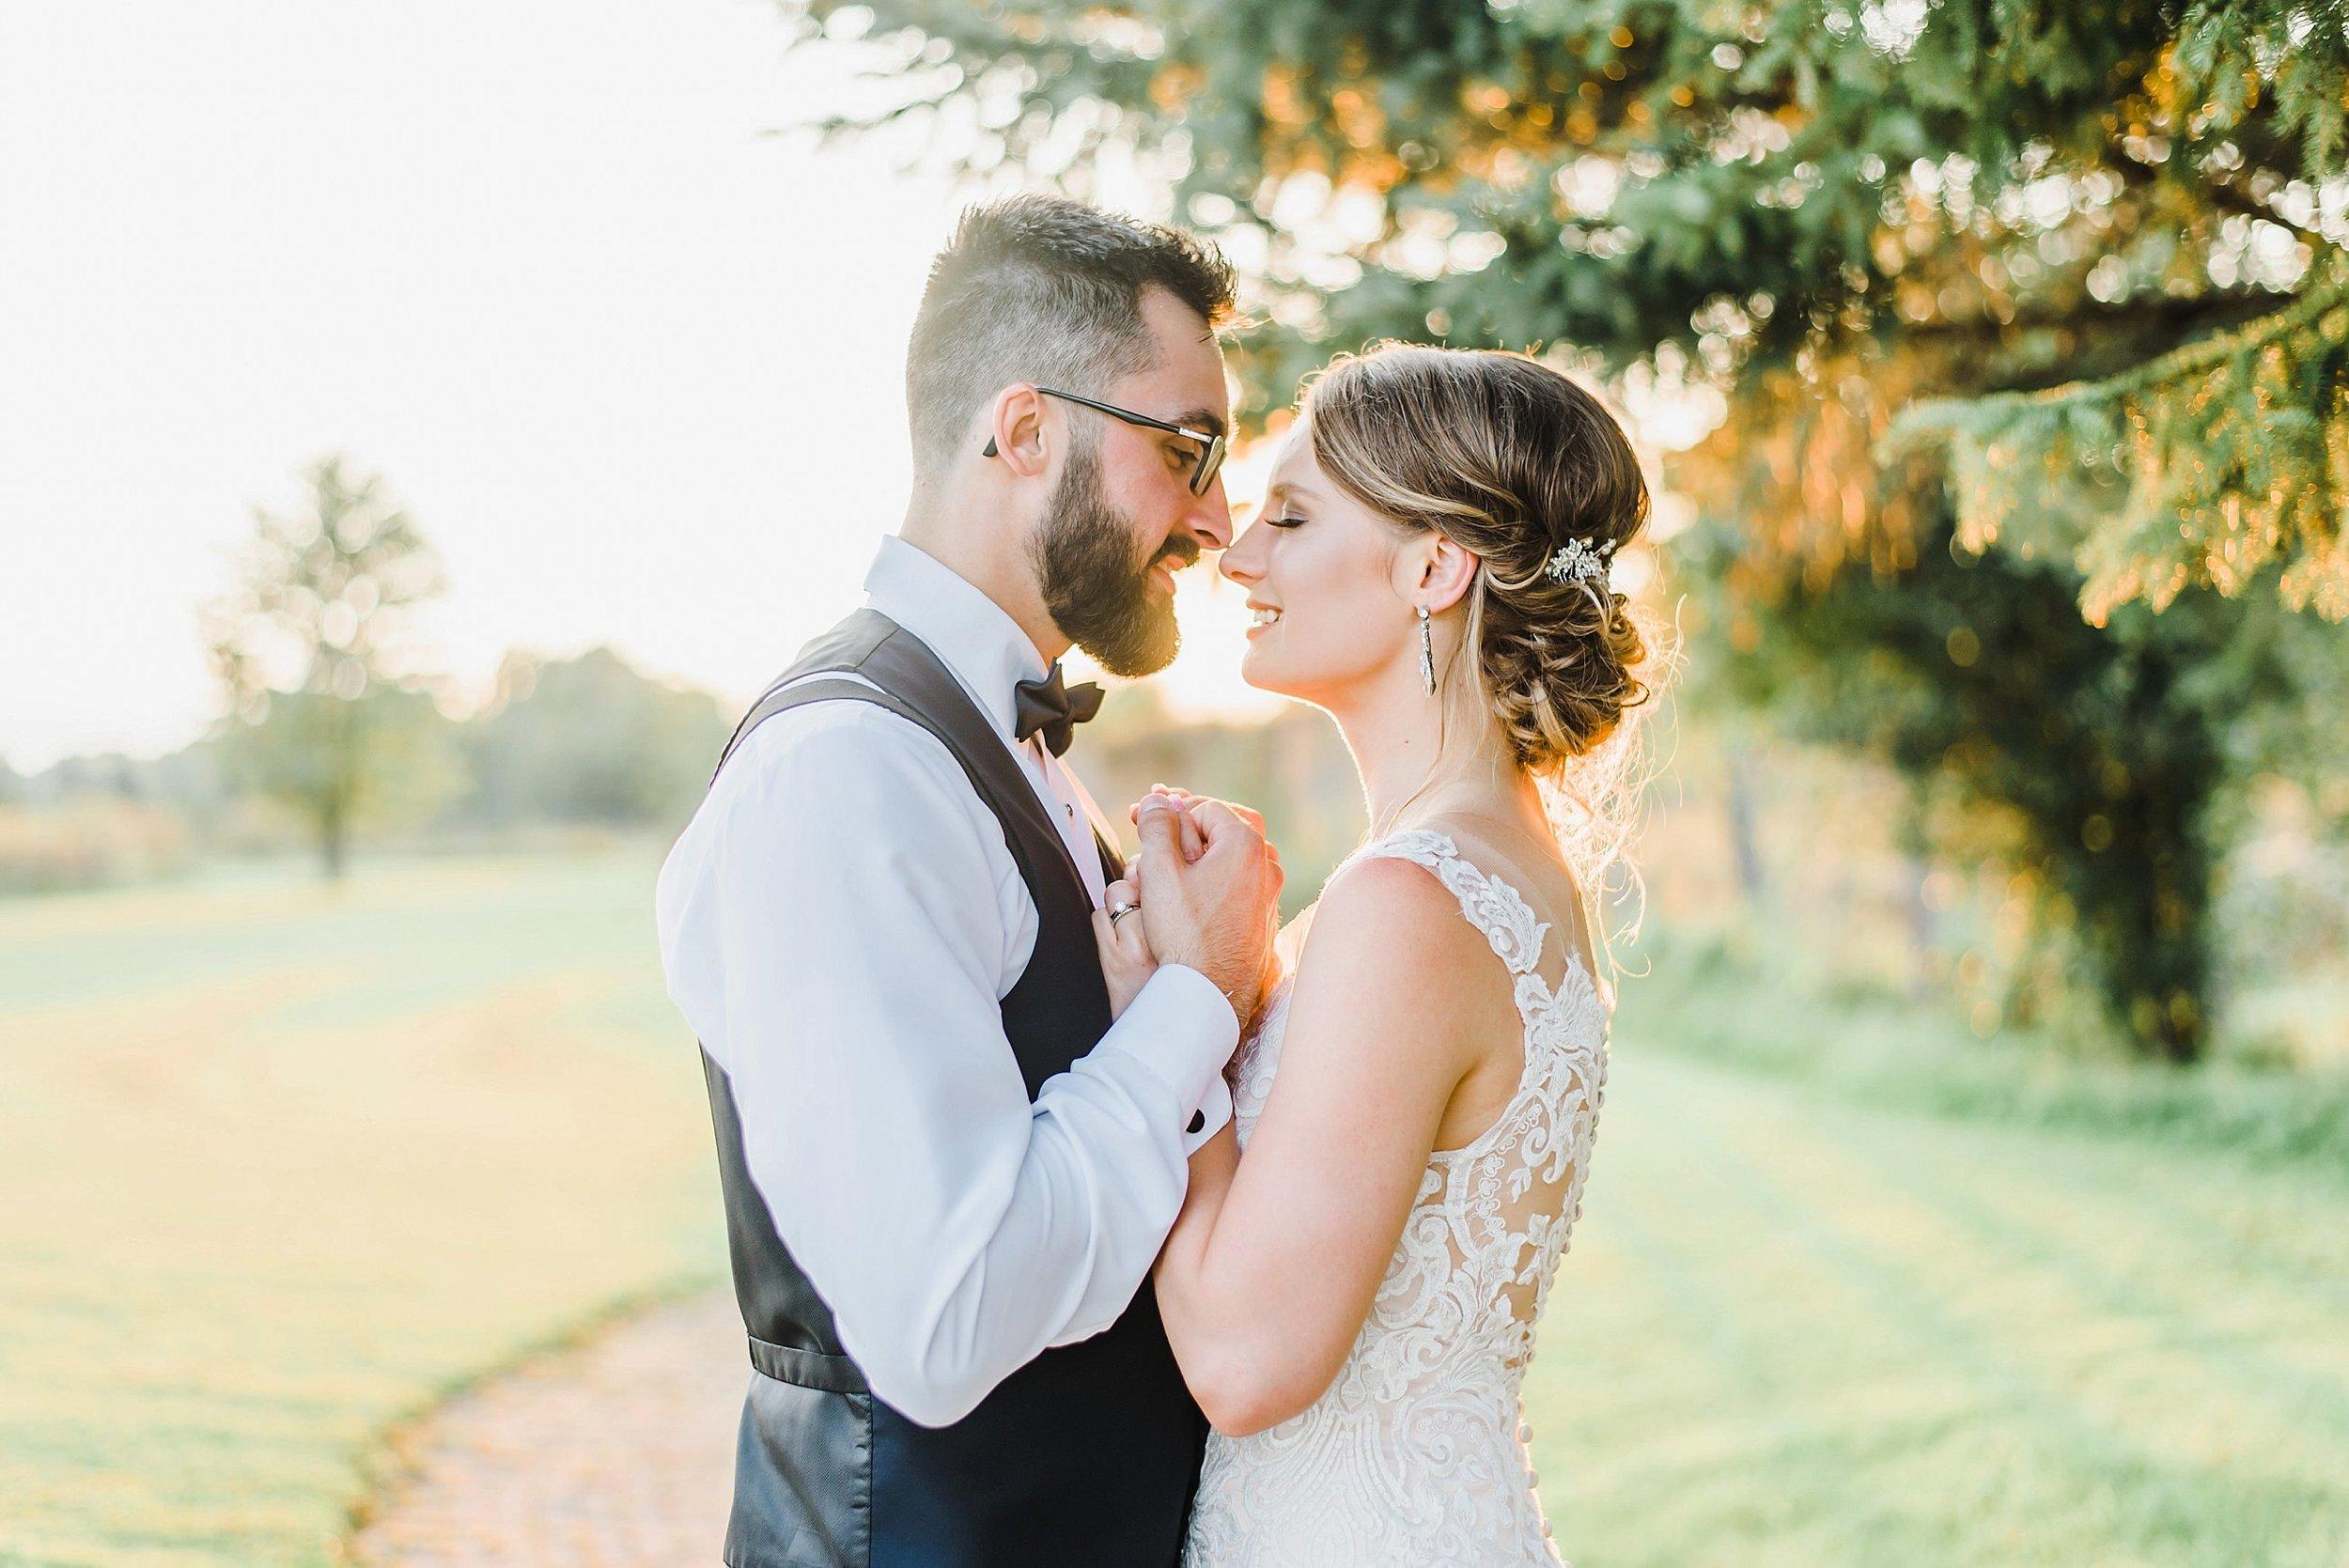 light airy indie fine art ottawa wedding photographer | Ali and Batoul Photography_1354.jpg